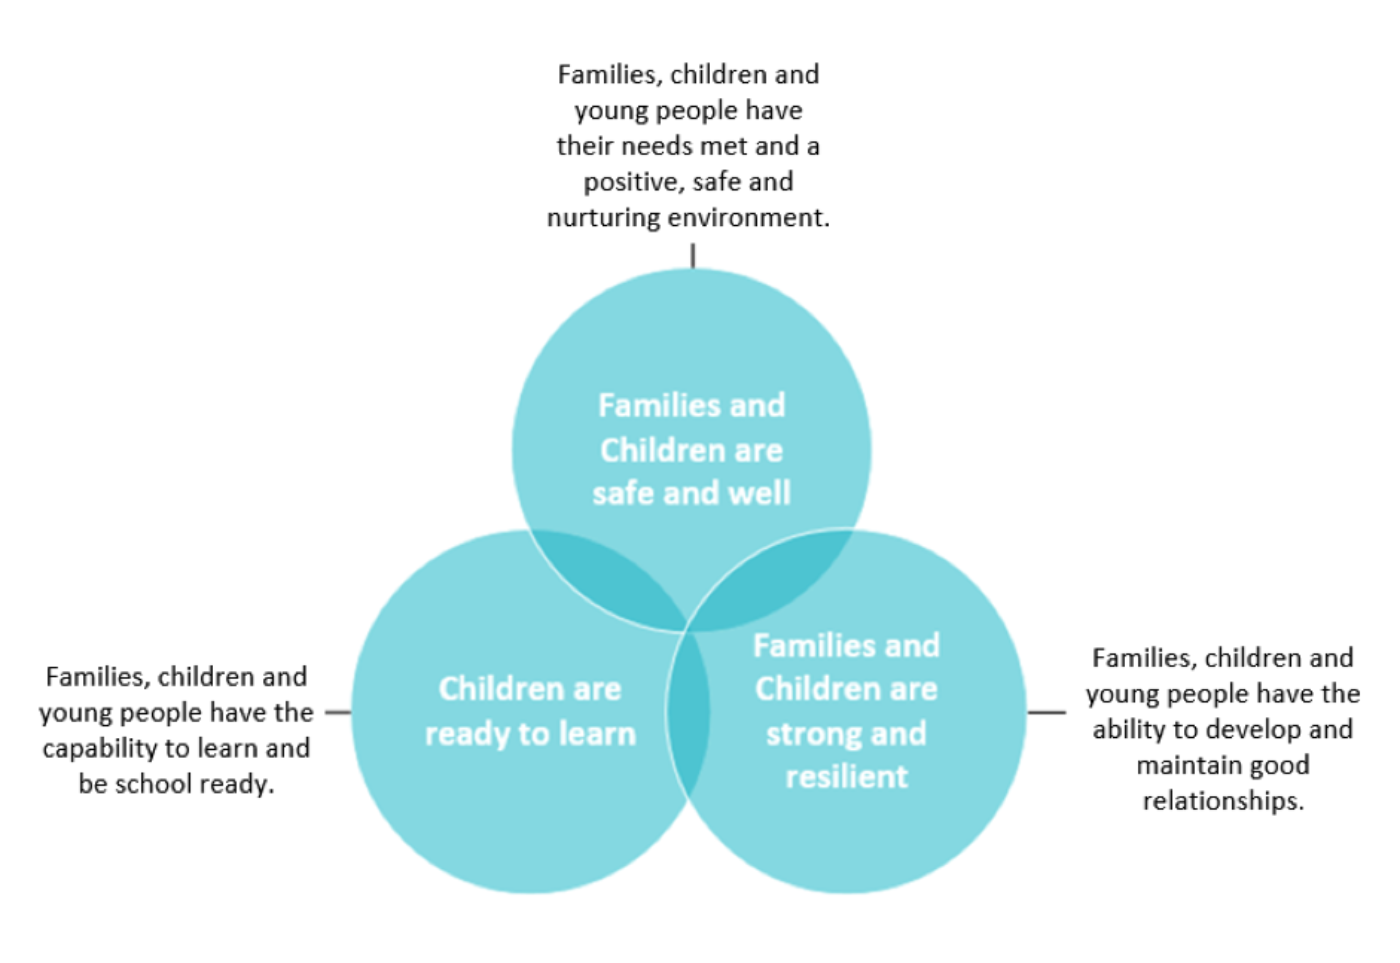 Families children